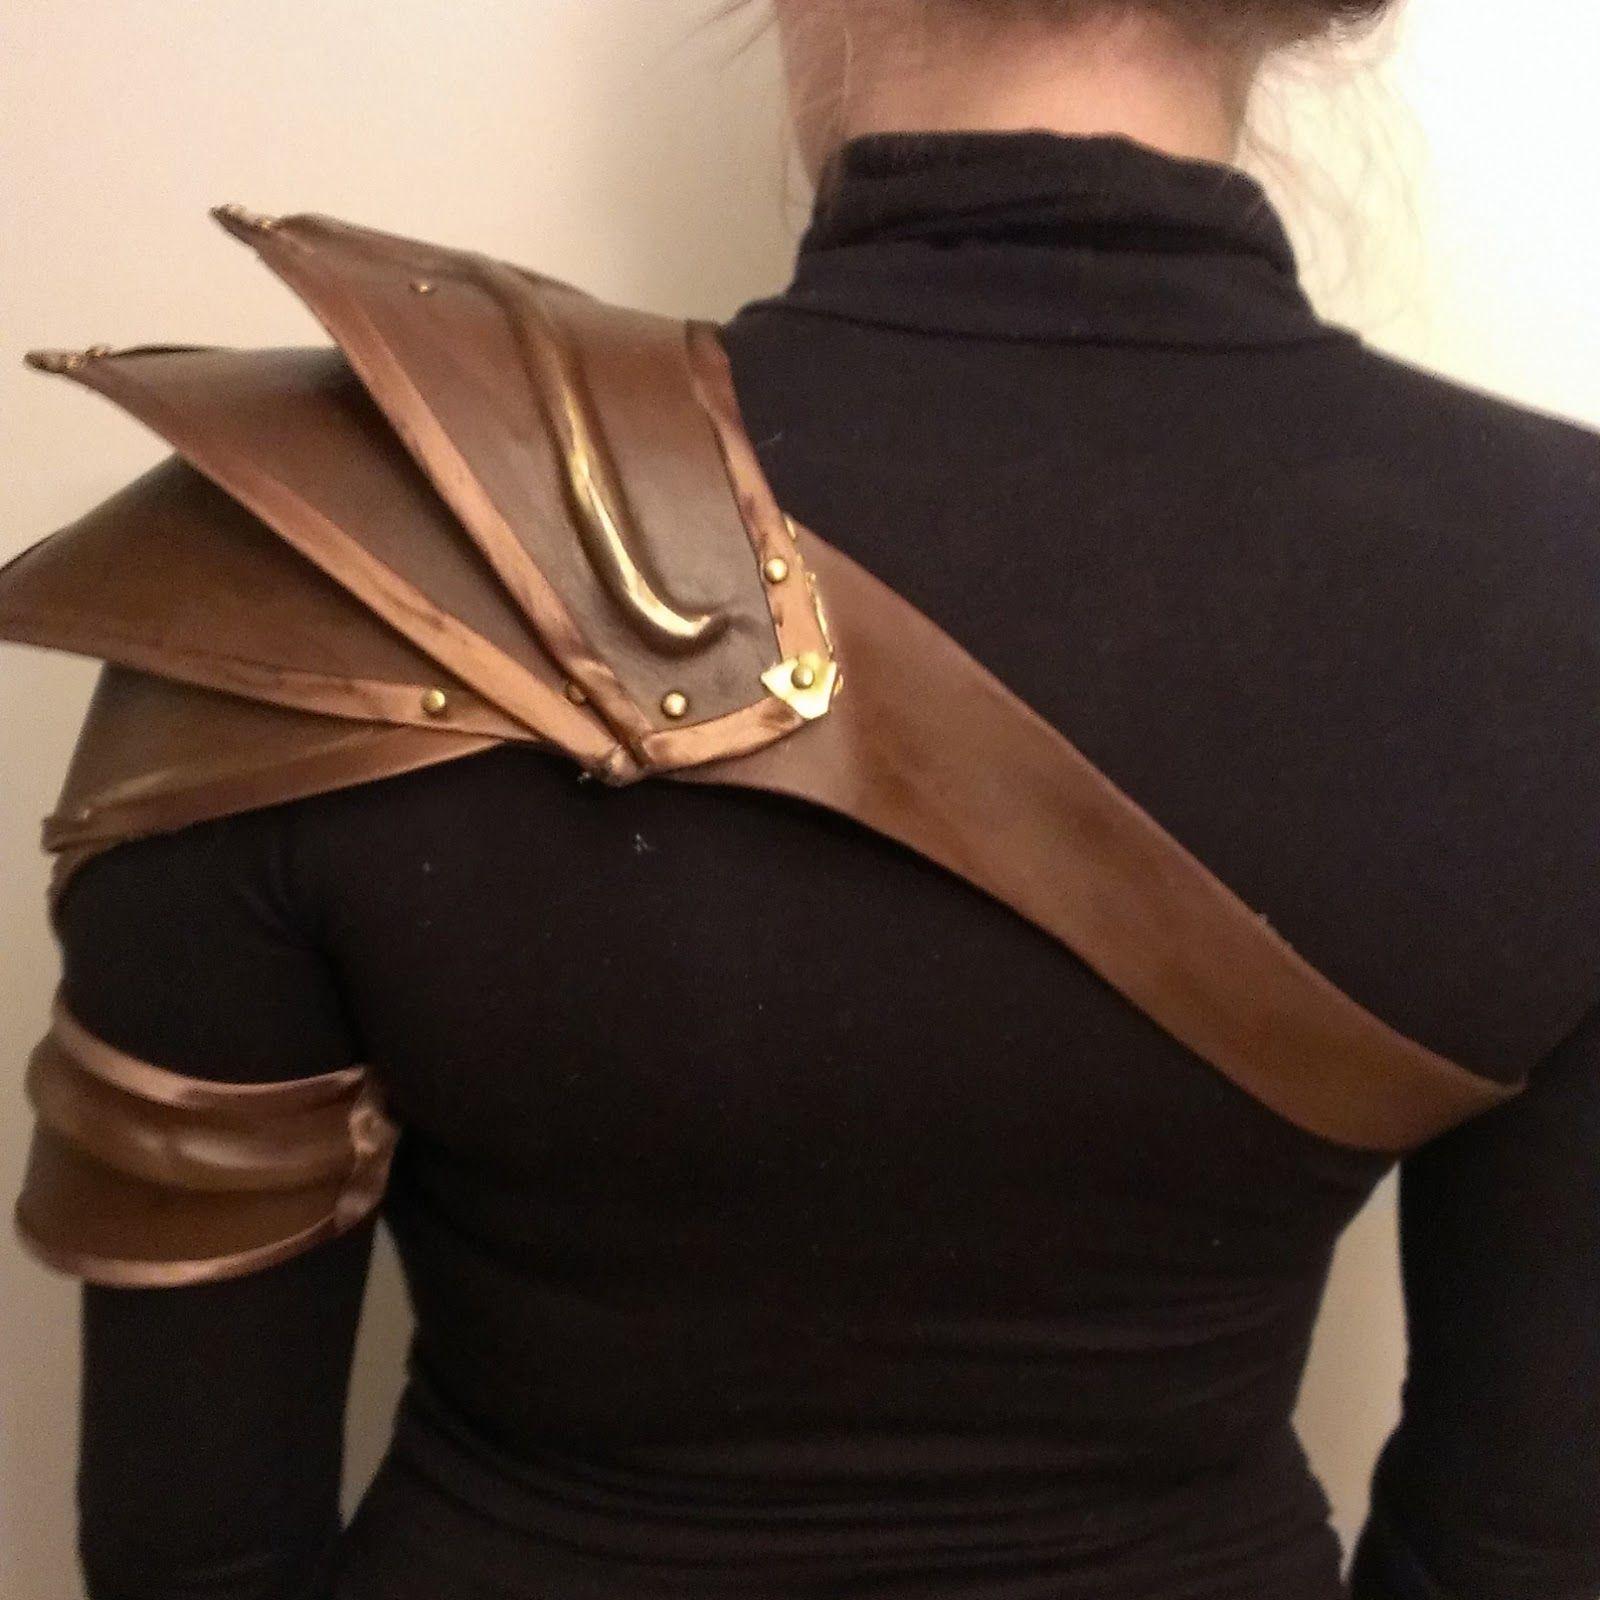 Cosplay DIY Armor Tutorial | Elvish Pauldrons Cosplay ...